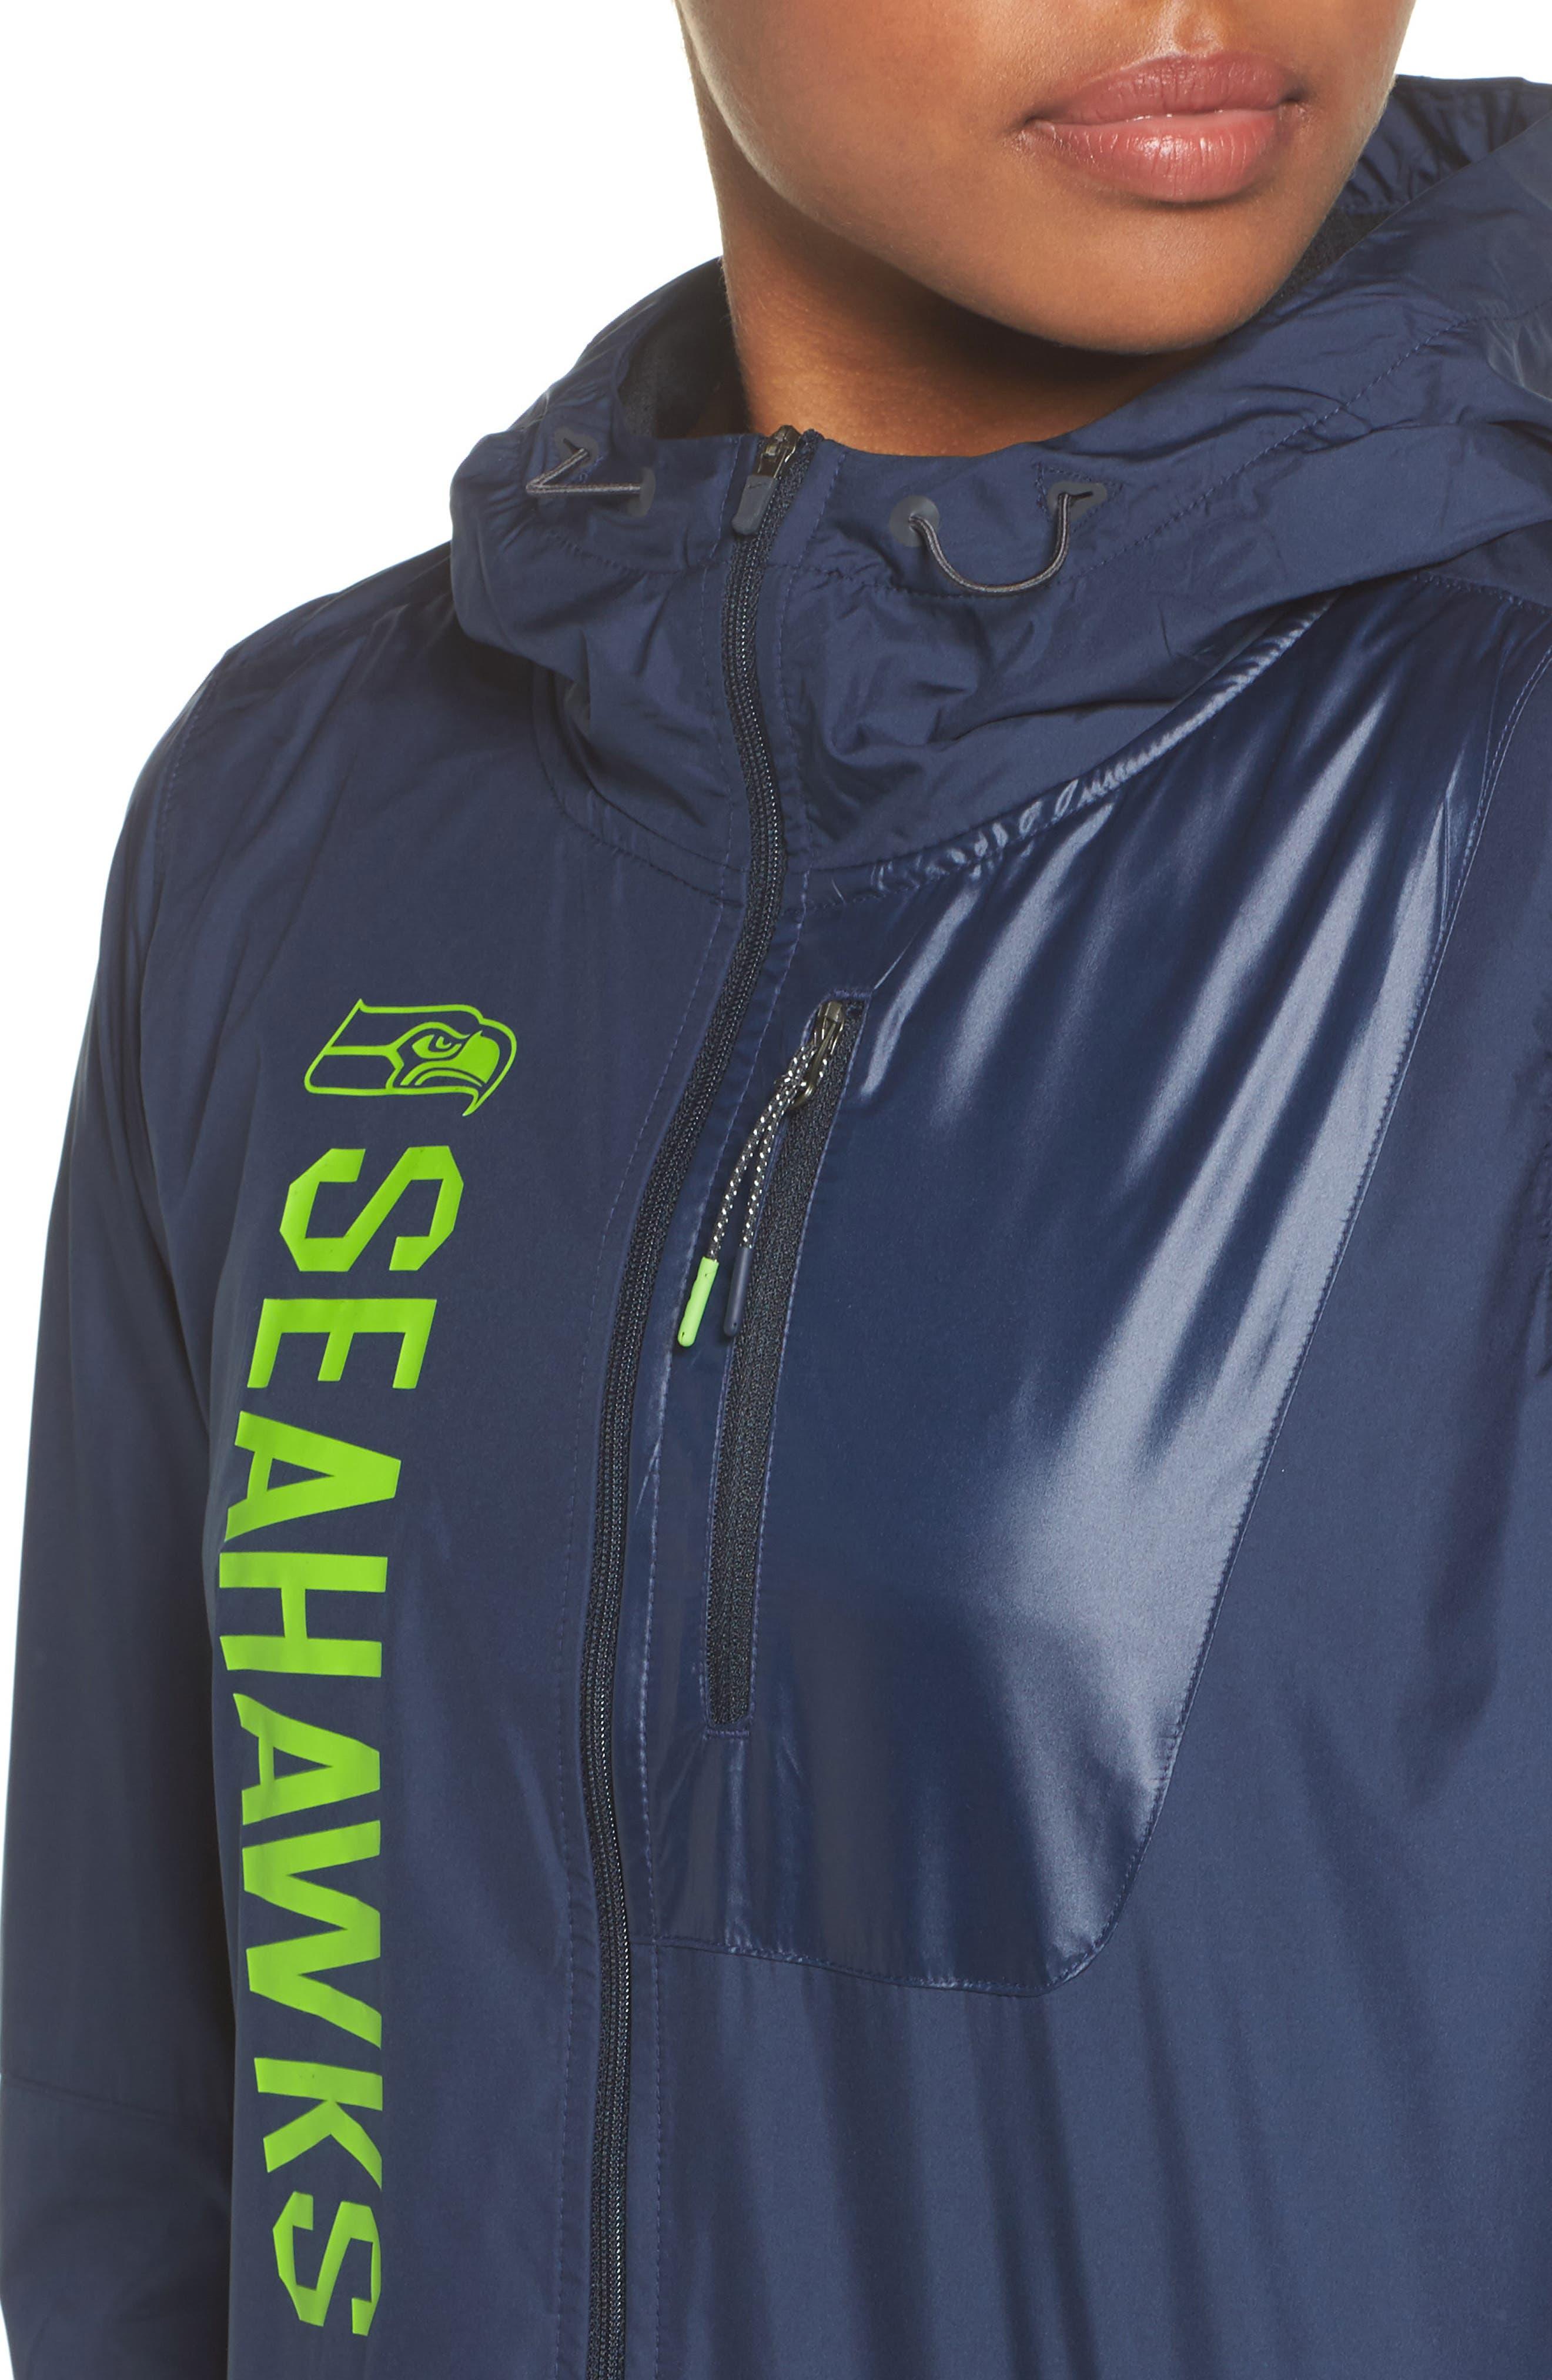 NFL Packable Water Resistant Jacket,                             Alternate thumbnail 4, color,                             College Navy/ Seahawks